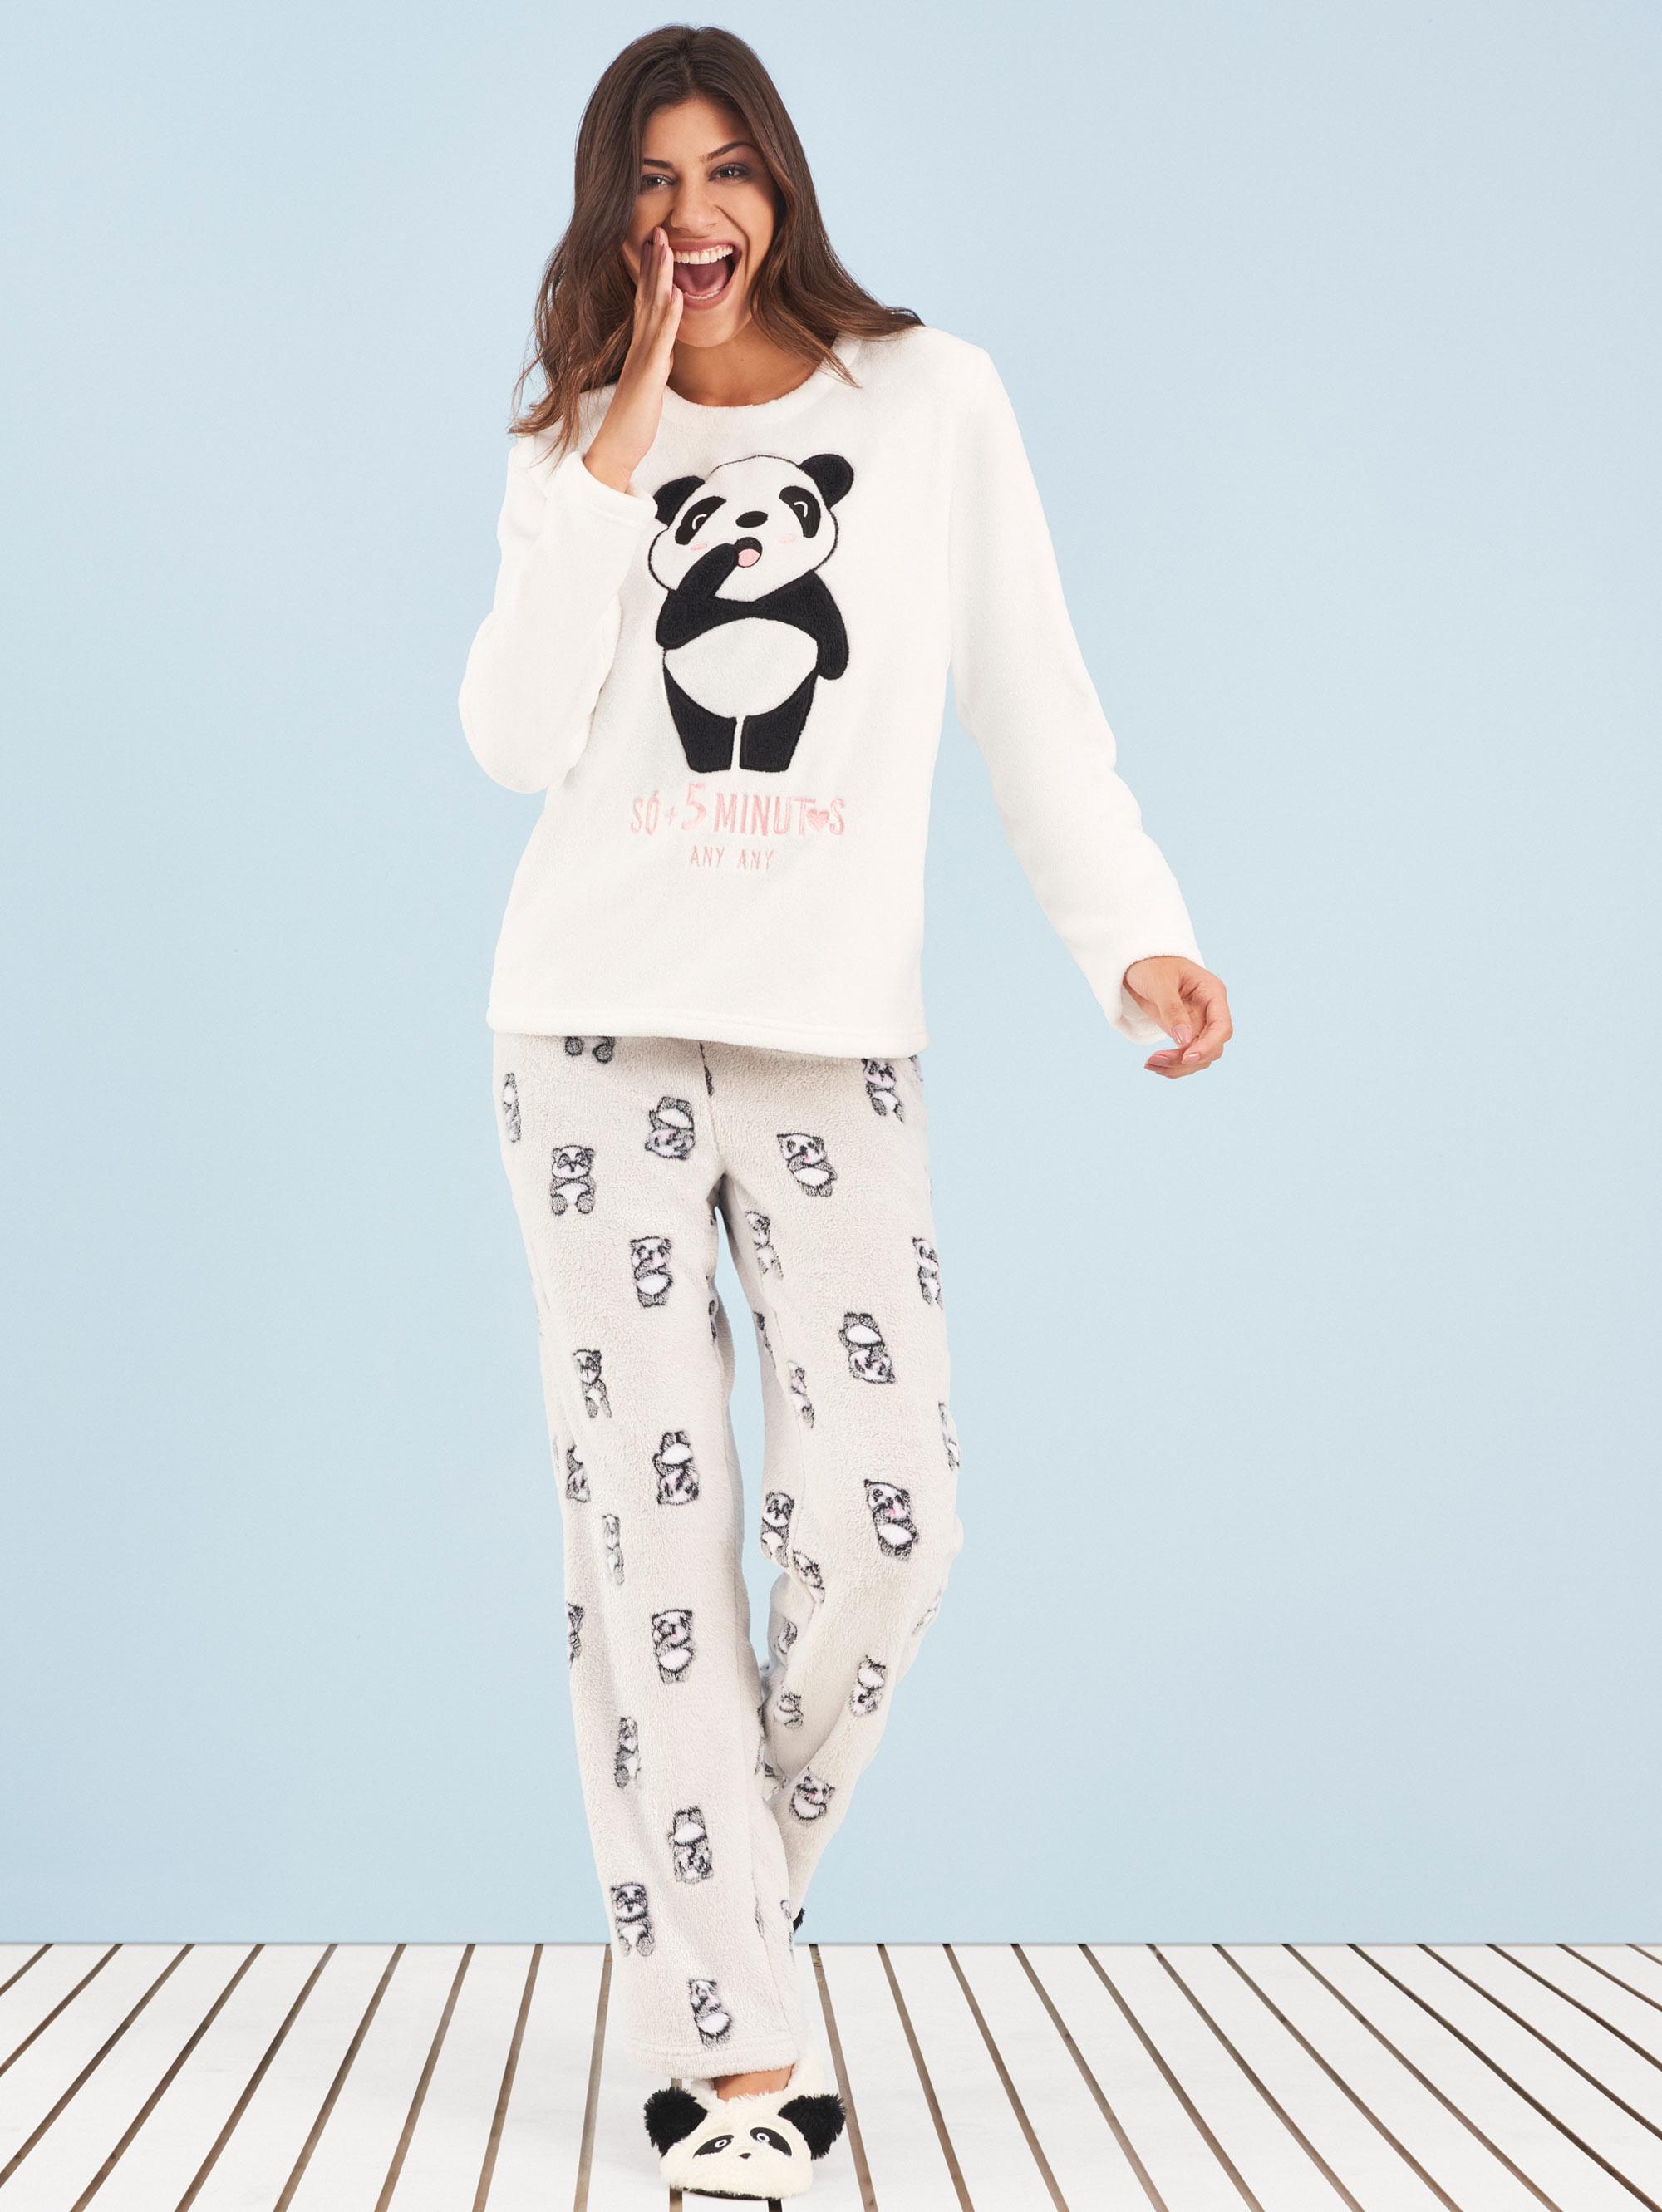 pijama-manga-longa-soft-panda-5-minutos-any-any